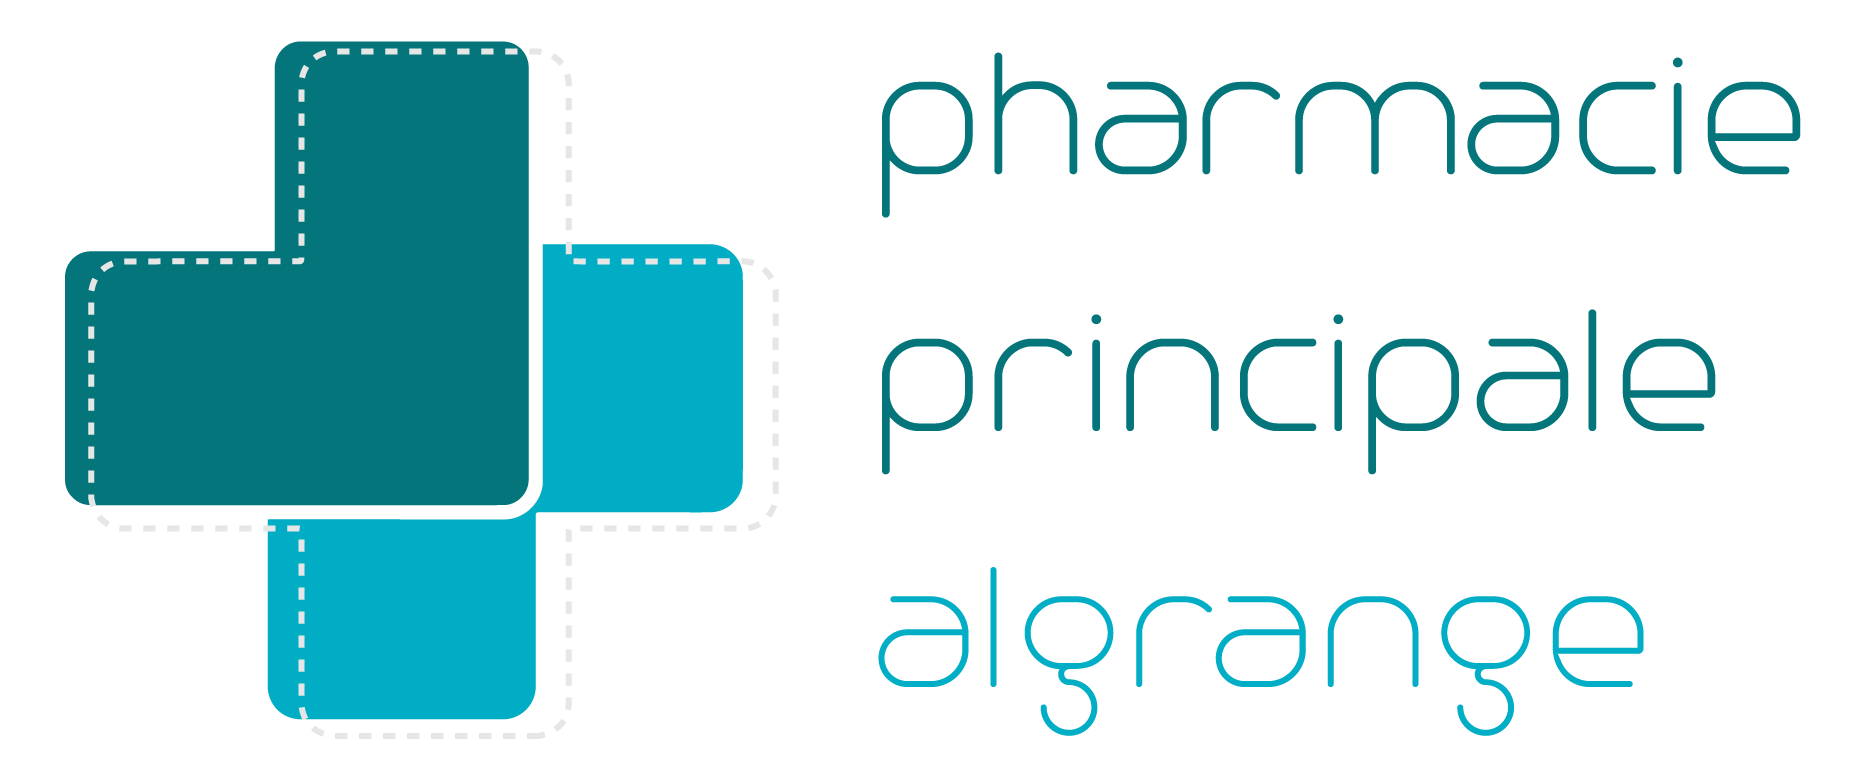 Pharmacie Principale Algrange